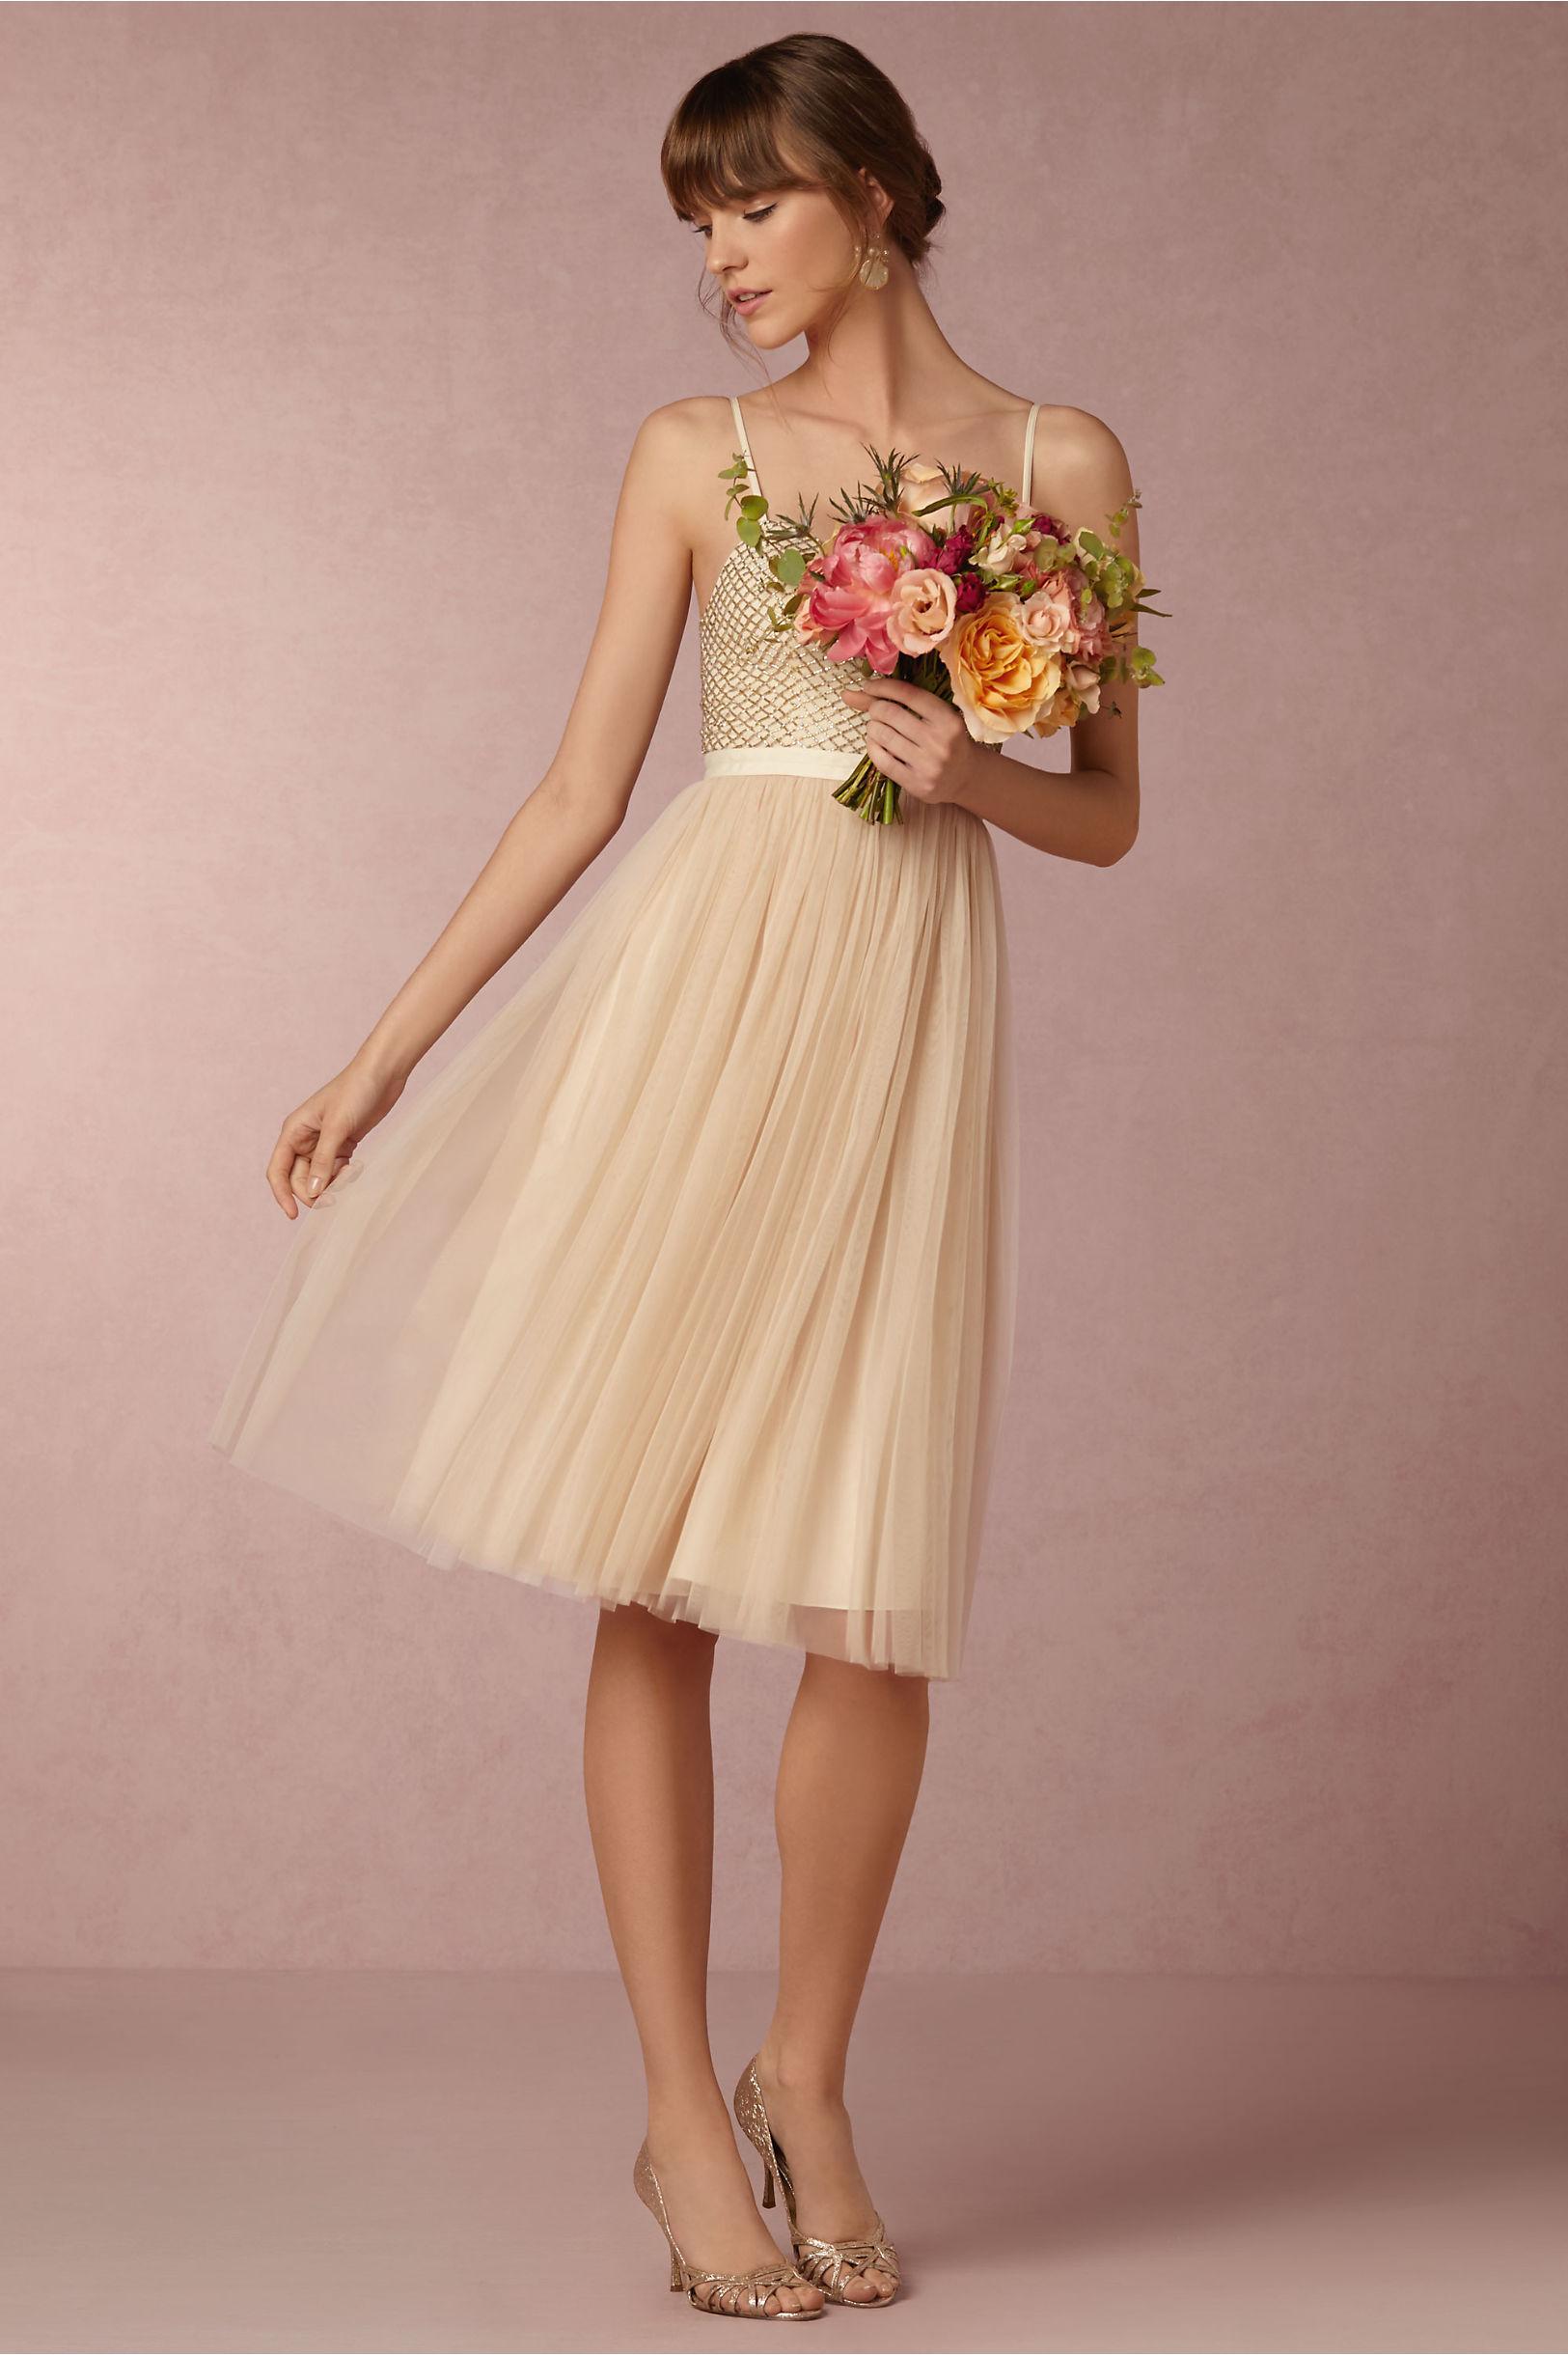 coppelia dress in sale bhldn